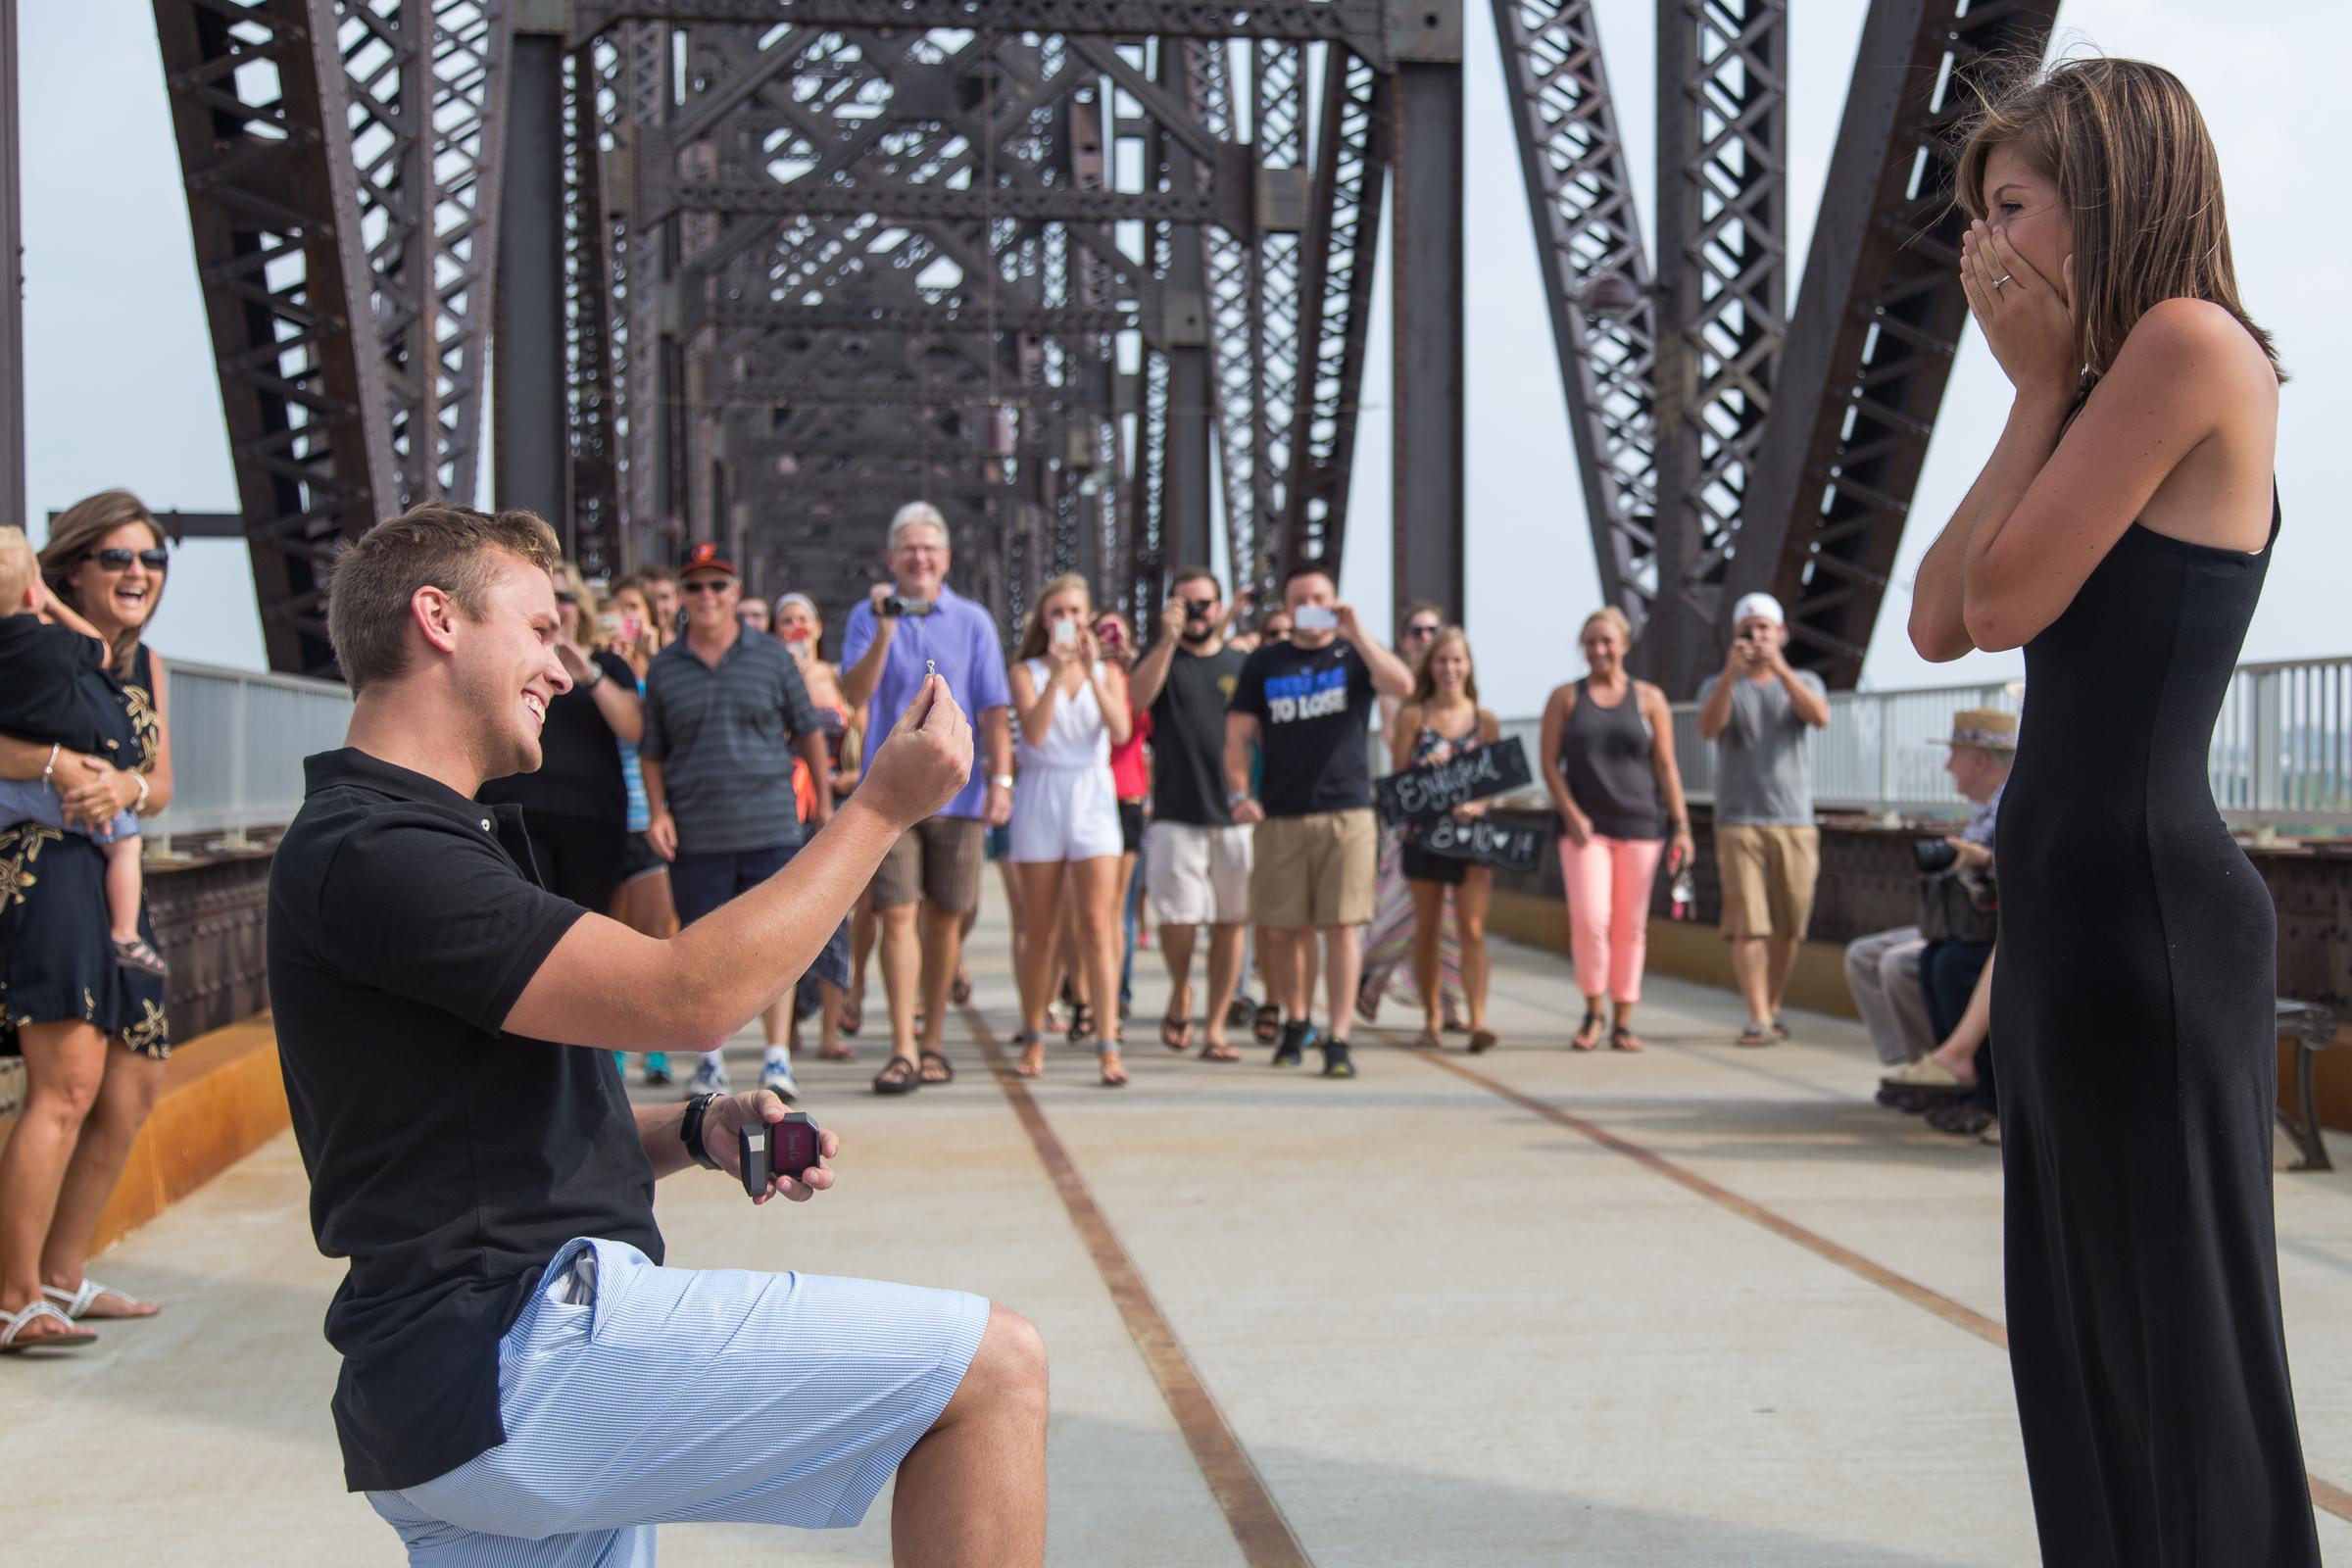 Image 2 of Jessica and Joseph's Walking Bridge Proposal in Louisville